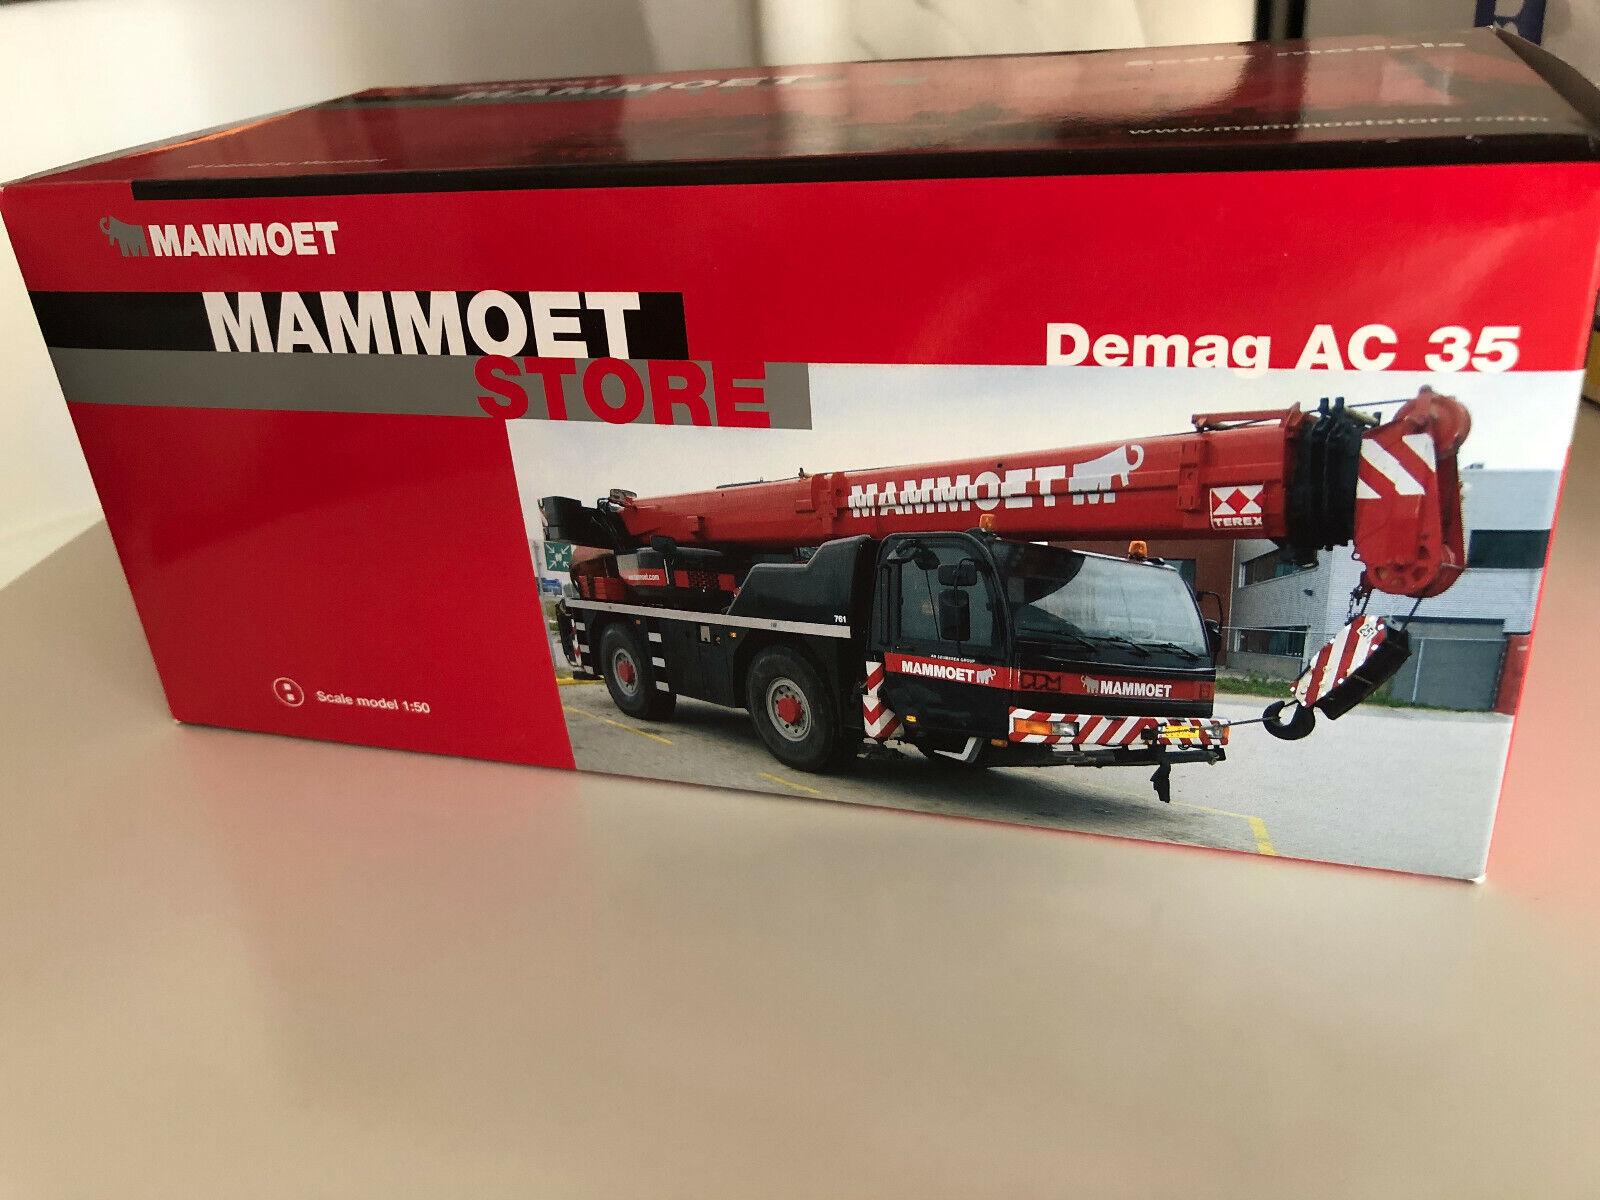 NZG Demag AC35 Mobile Crane Mammoet Brand New